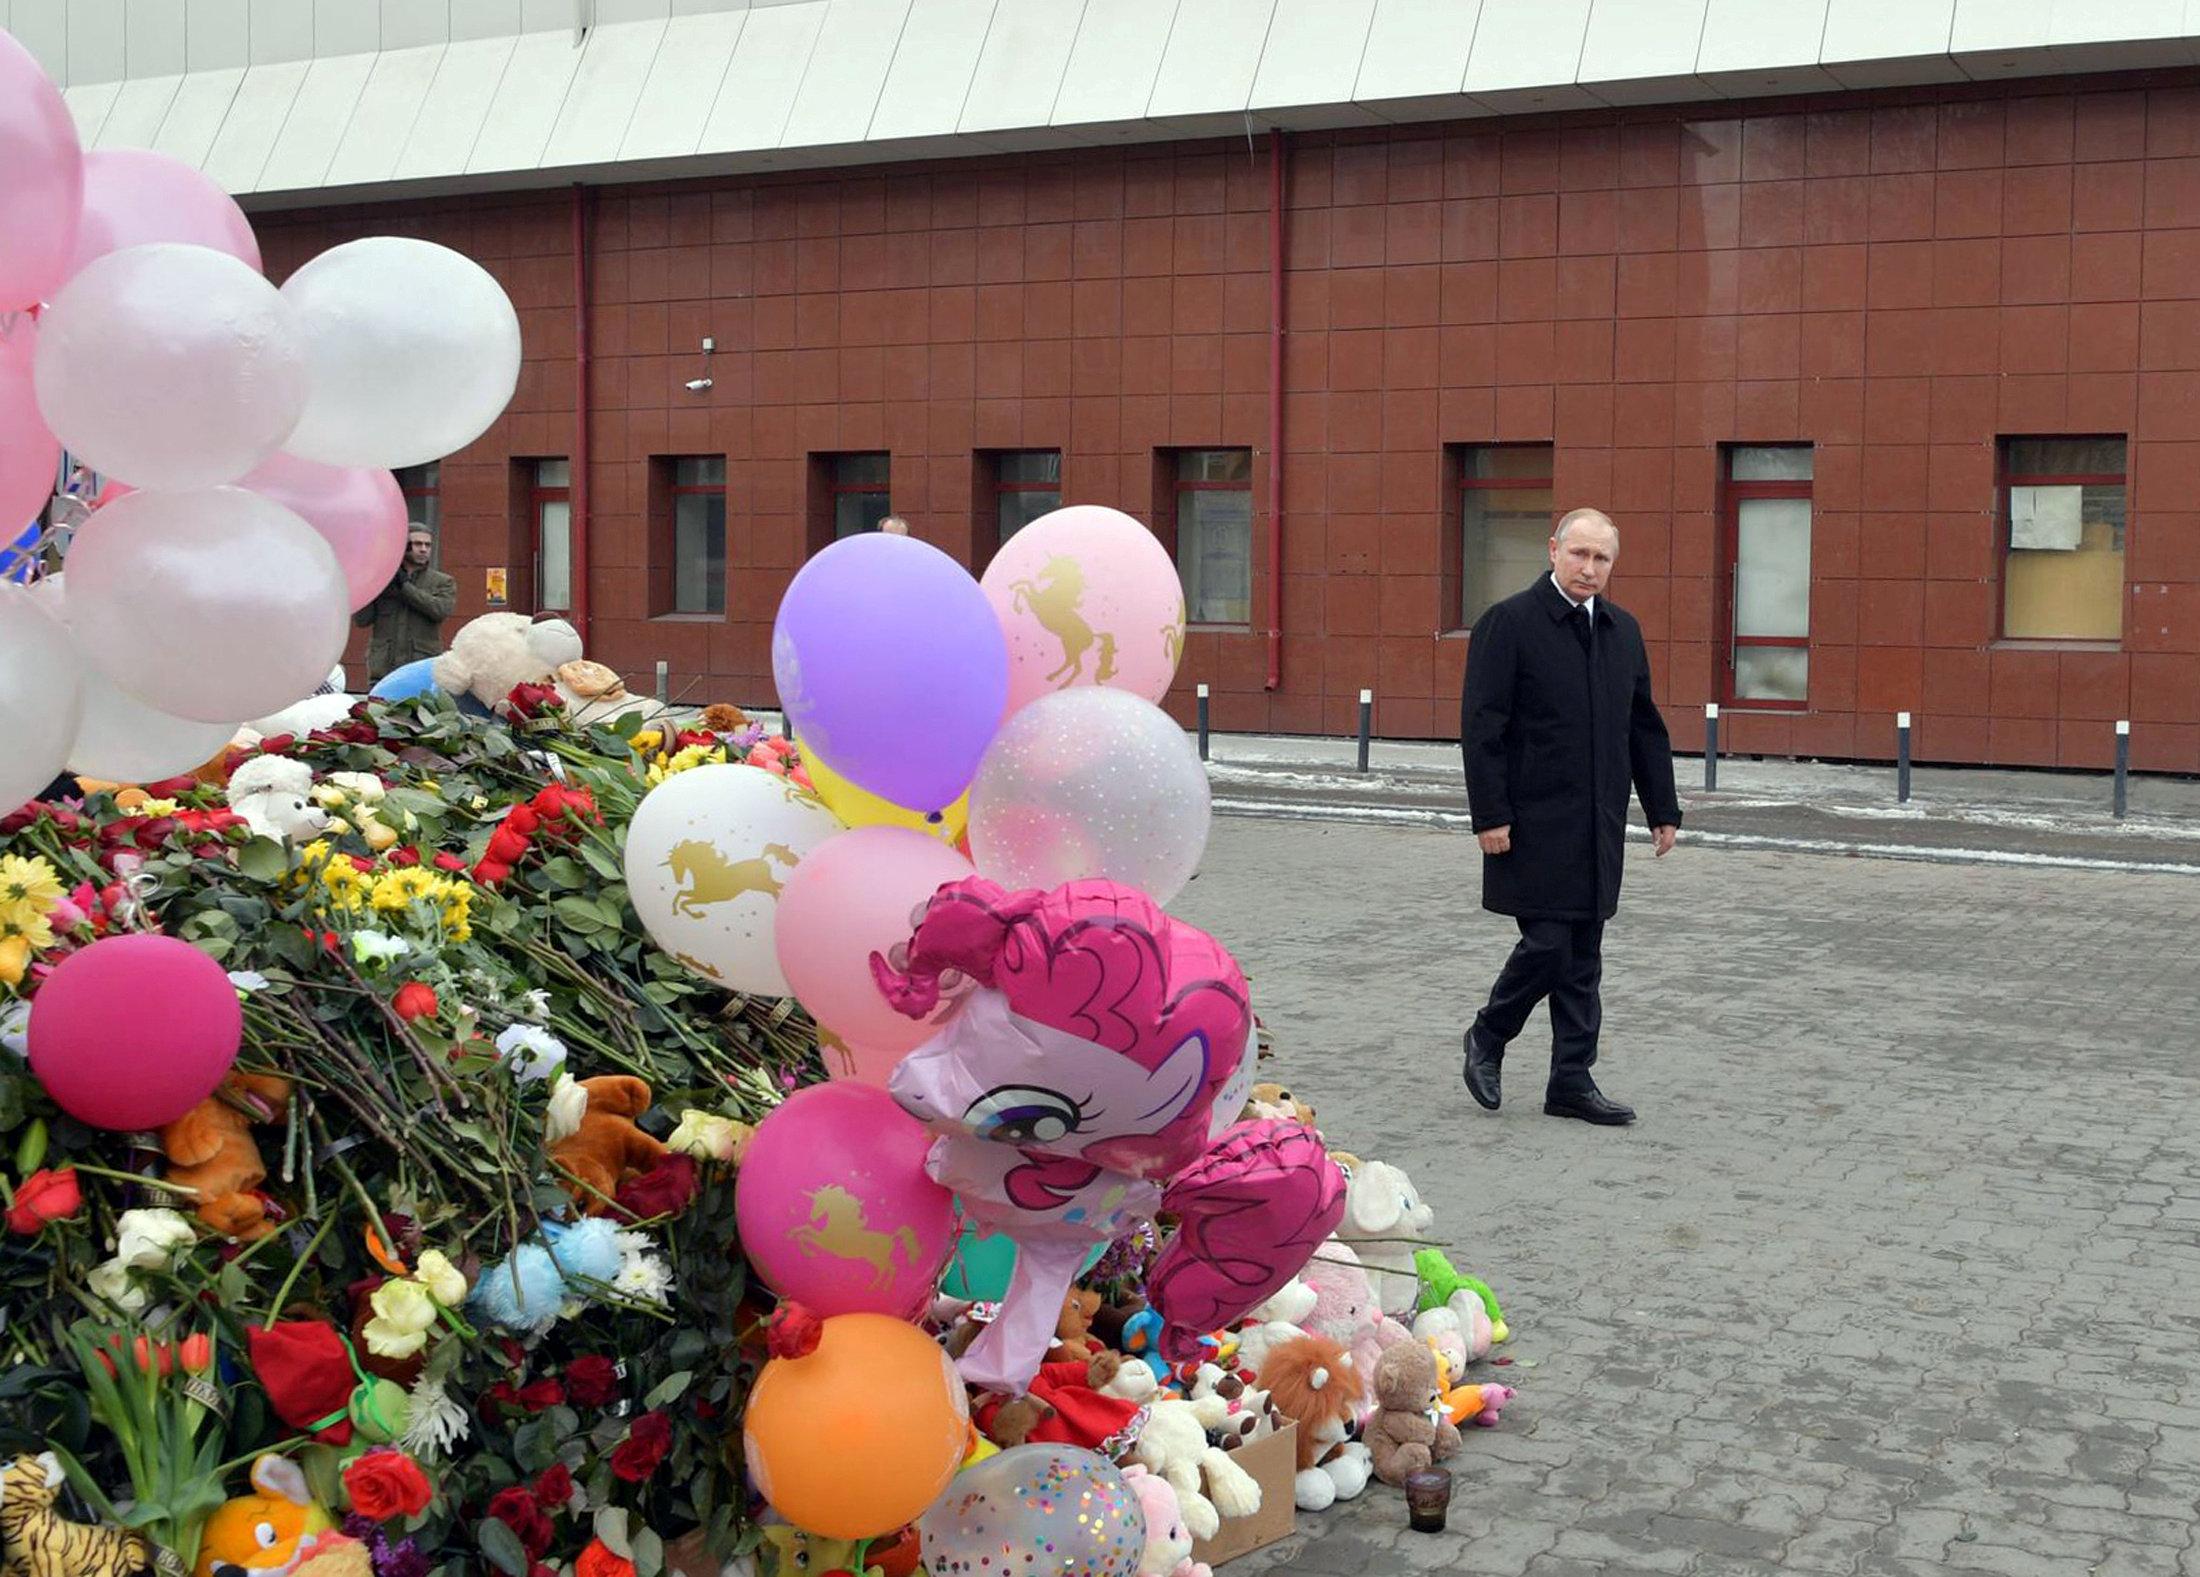 El presidente ruso Vladimir Putin en el lugar del incendio (Sputnik/Alexei Druzhinin/Kremlin via REUTERS)